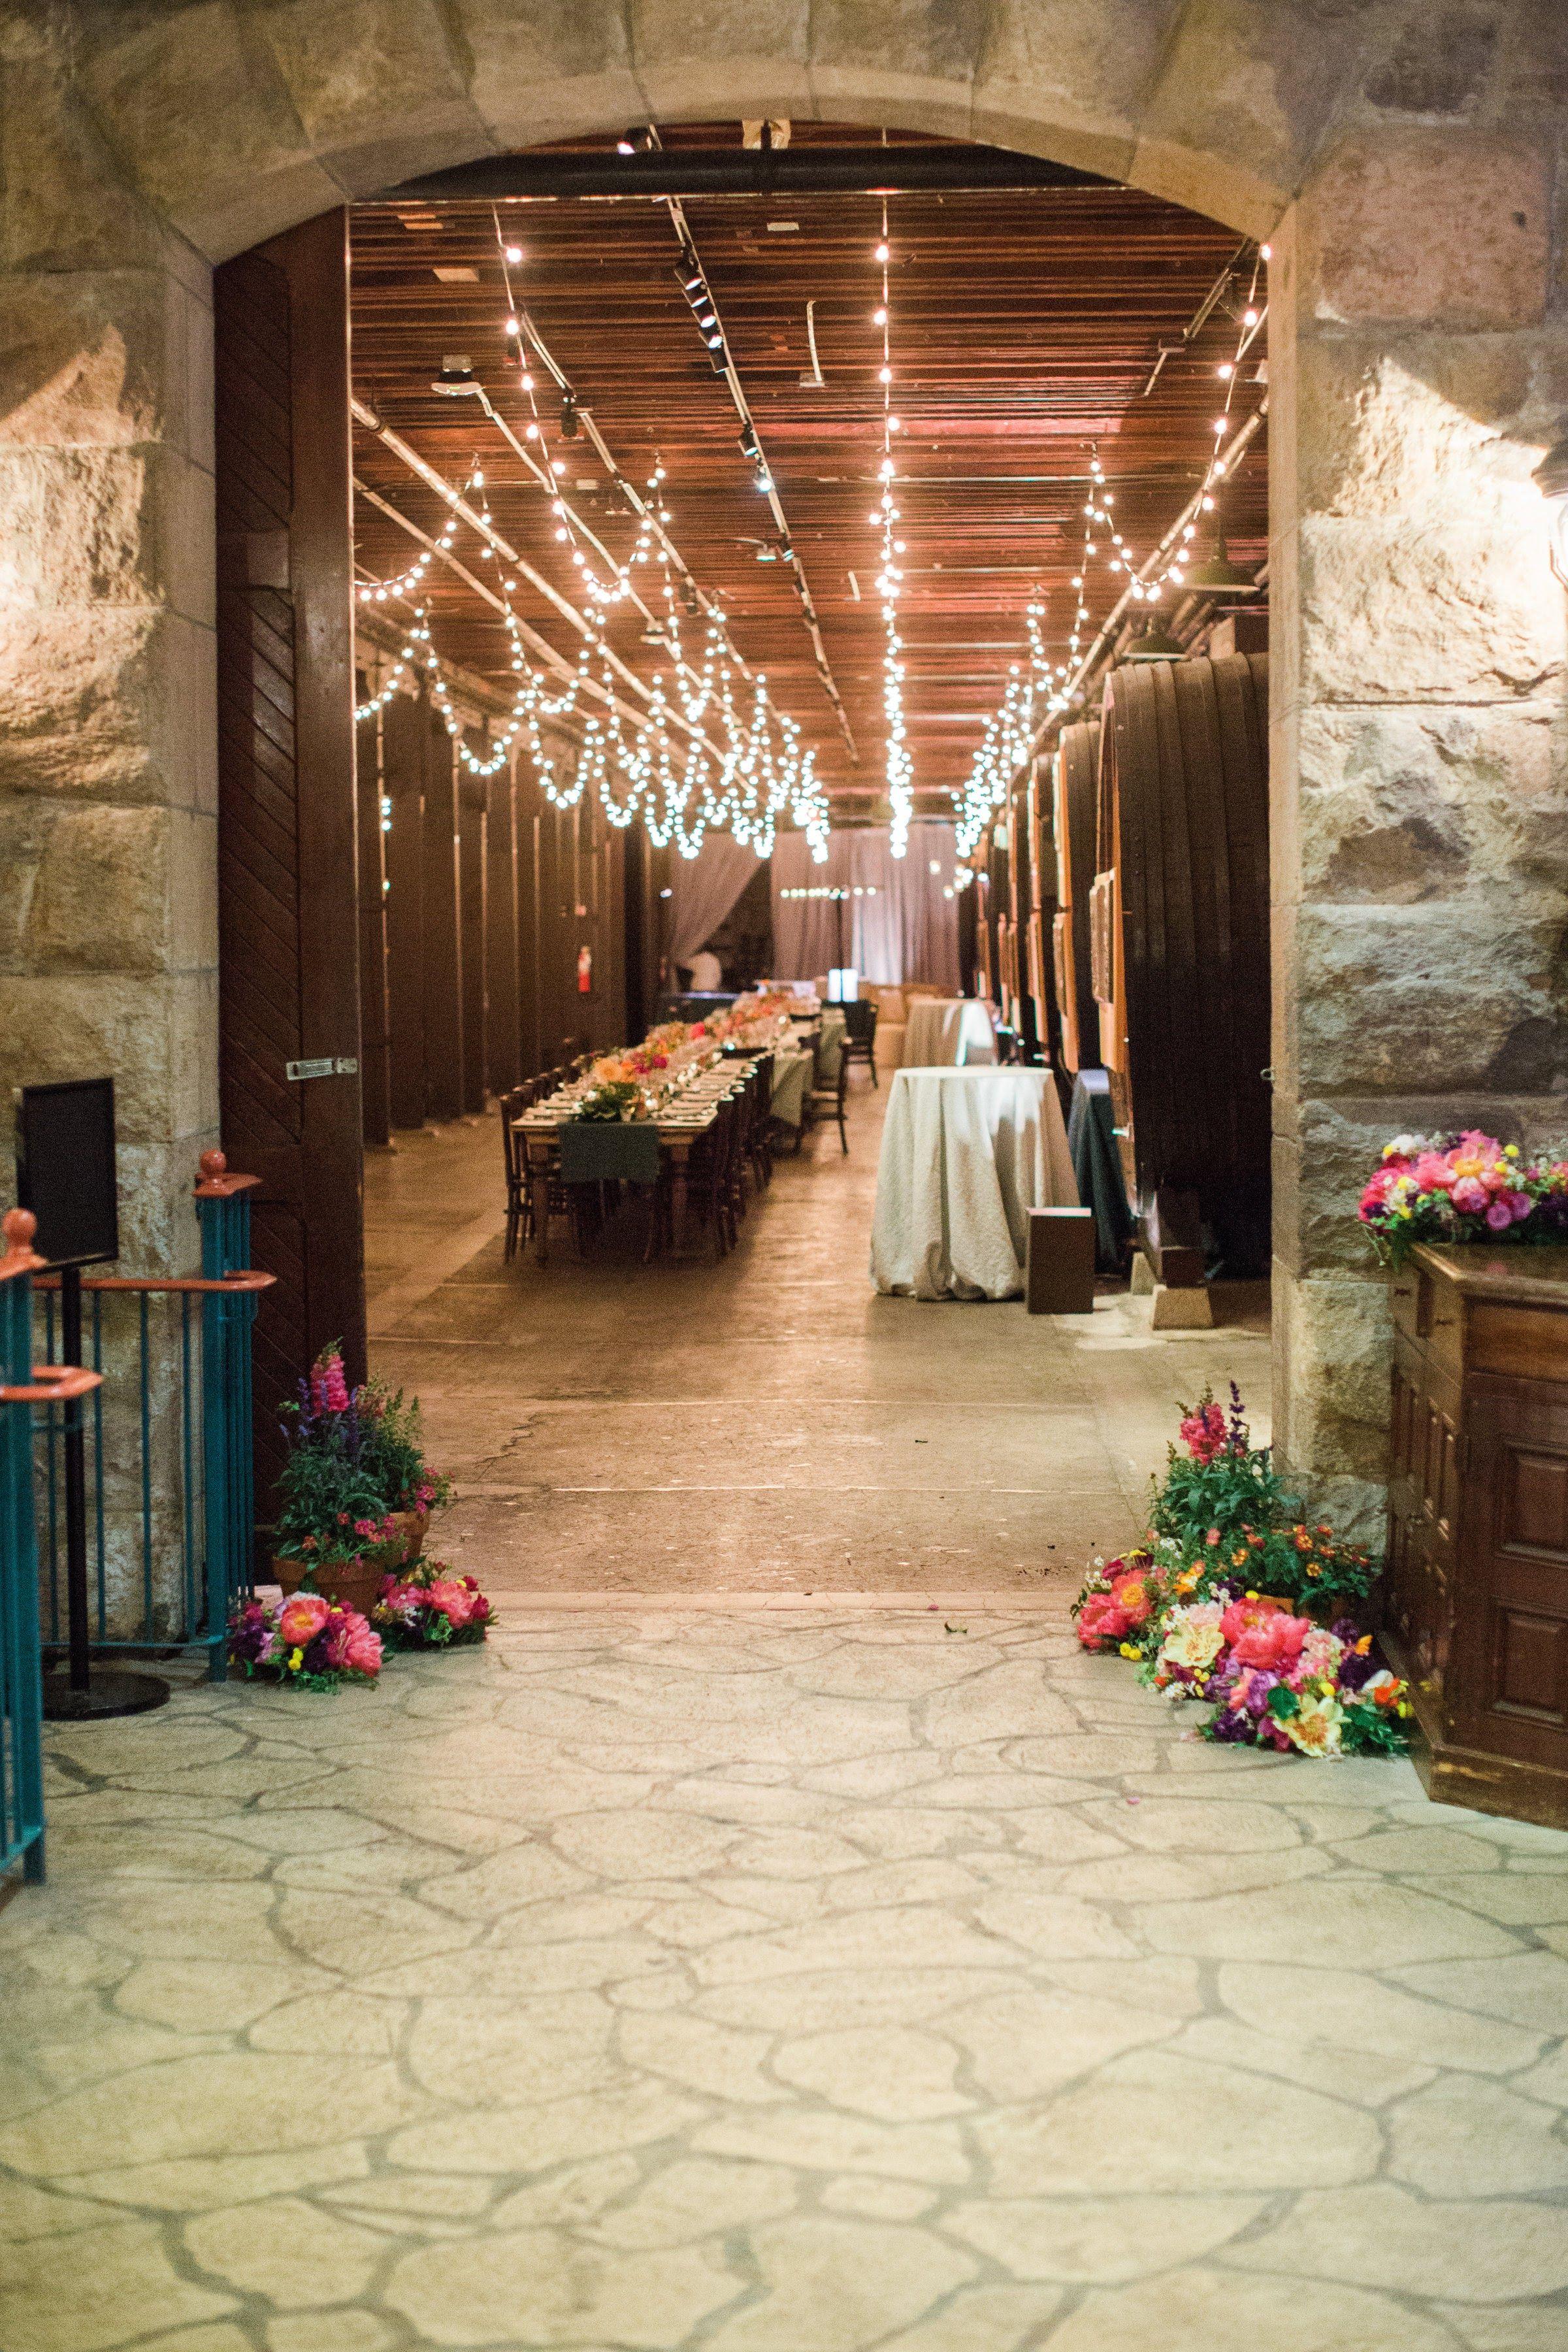 The Historic Barrel Room Napa Valley Wedding Venues Napa Valley Wedding Wine Country Wedding Venues